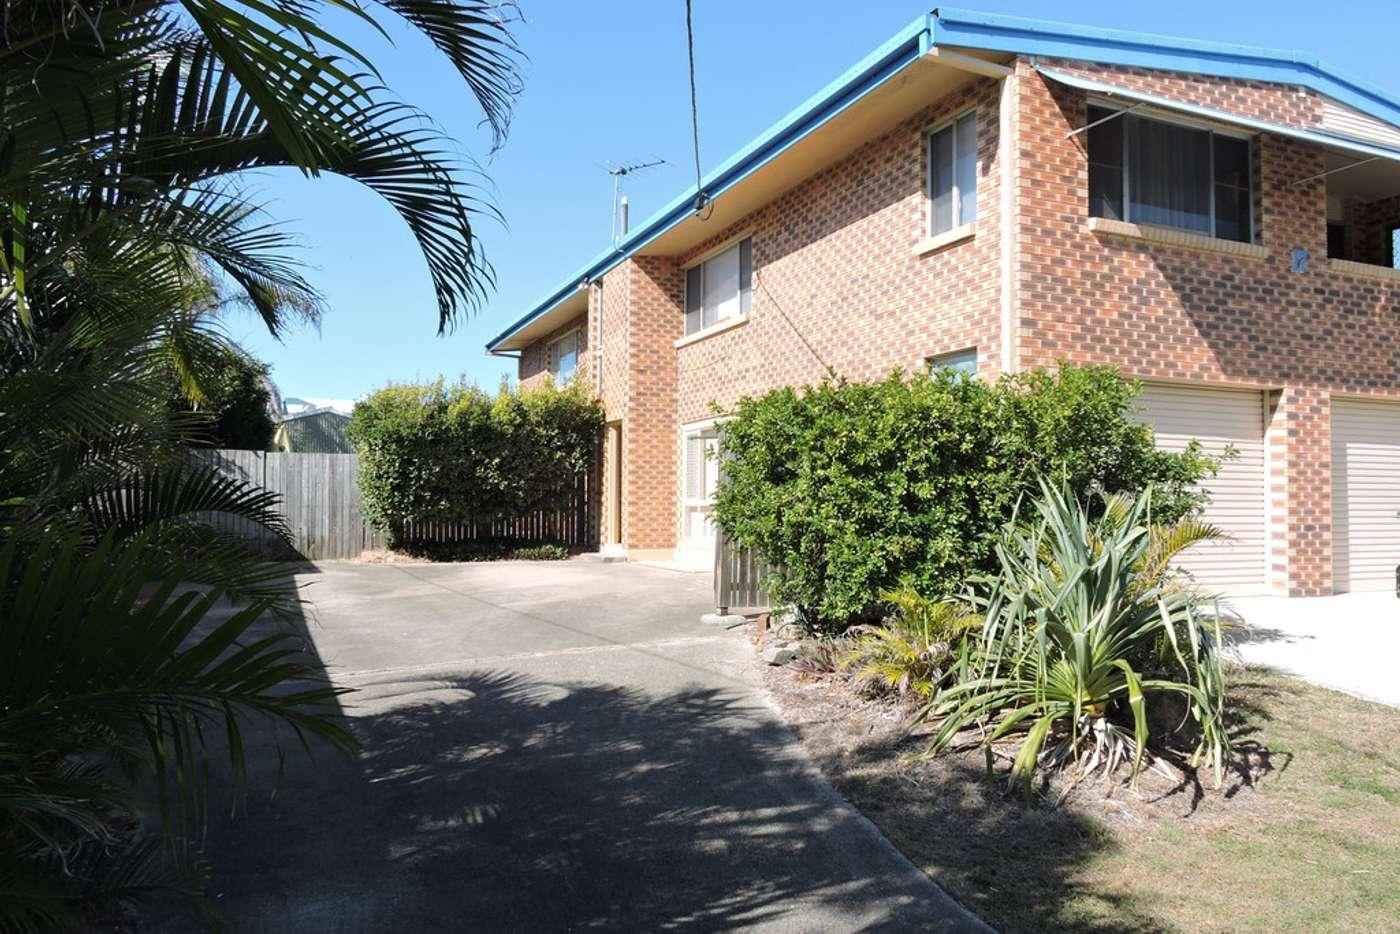 Main view of Homely unit listing, 1/17 Cicada Street, Woorim QLD 4507